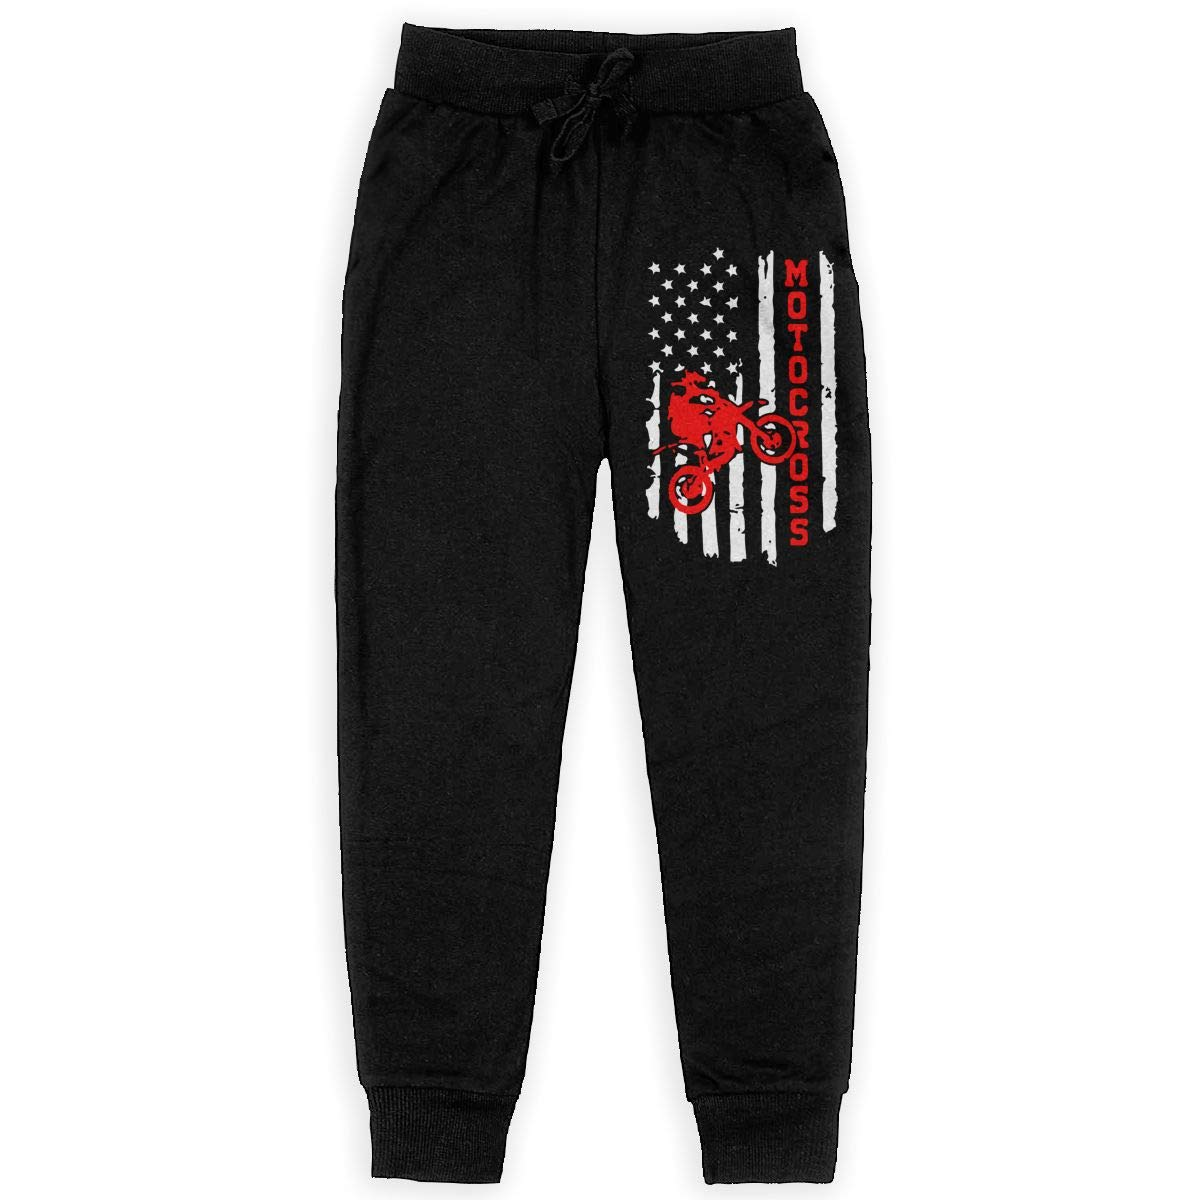 MAOYI/&J6 American Flag Motocross Dirt Bike Long Sweatpants Teenager Boys Girls Jogger Pants with Pockets